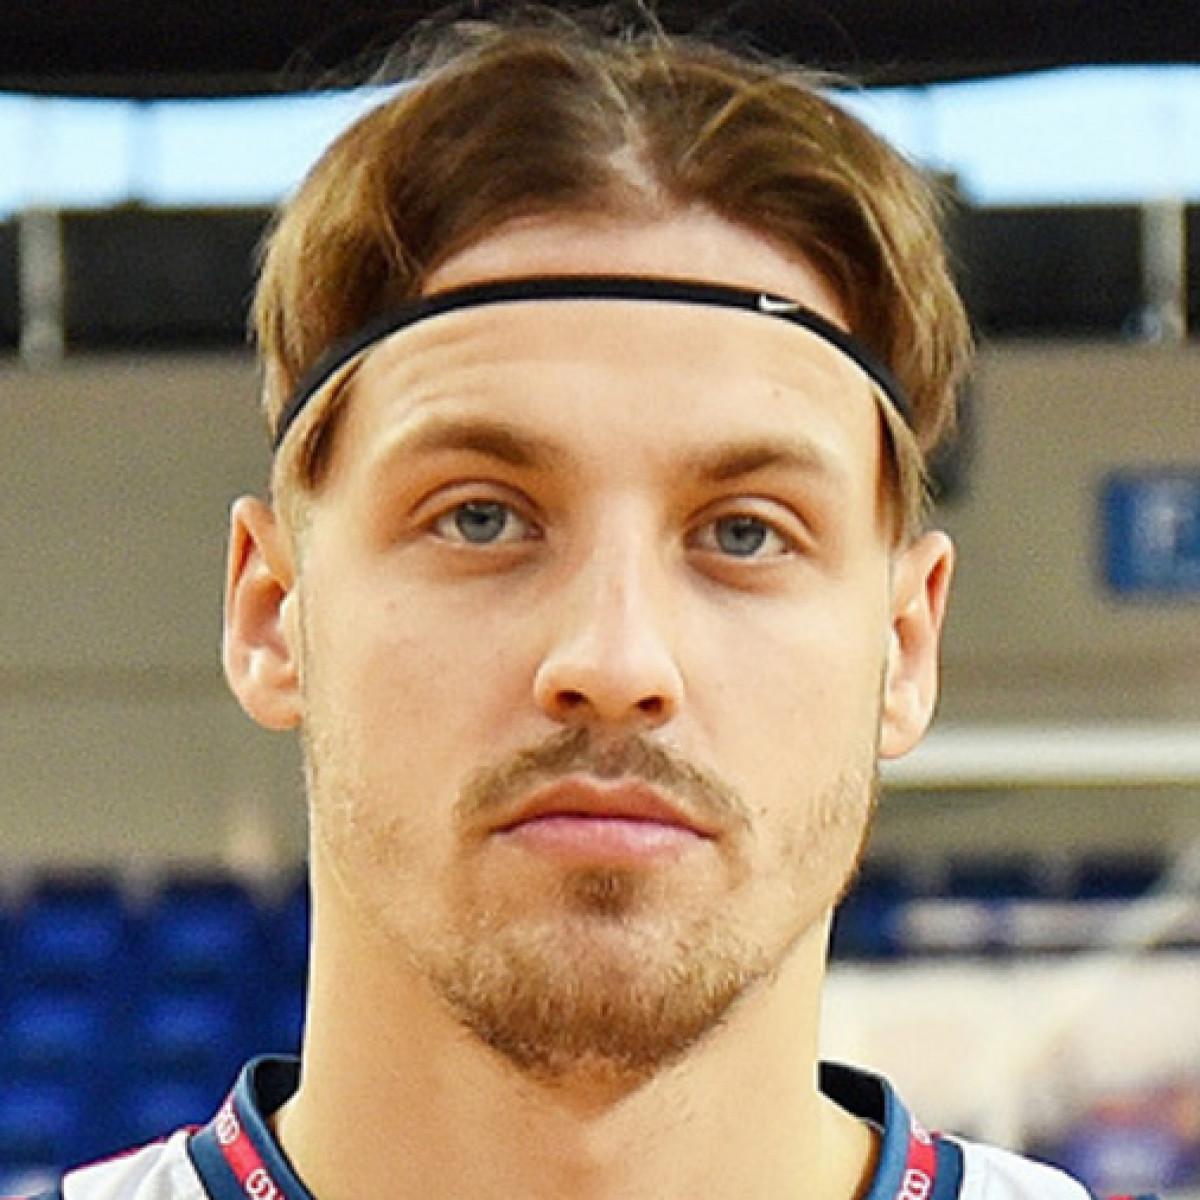 Martynas Pacevicius